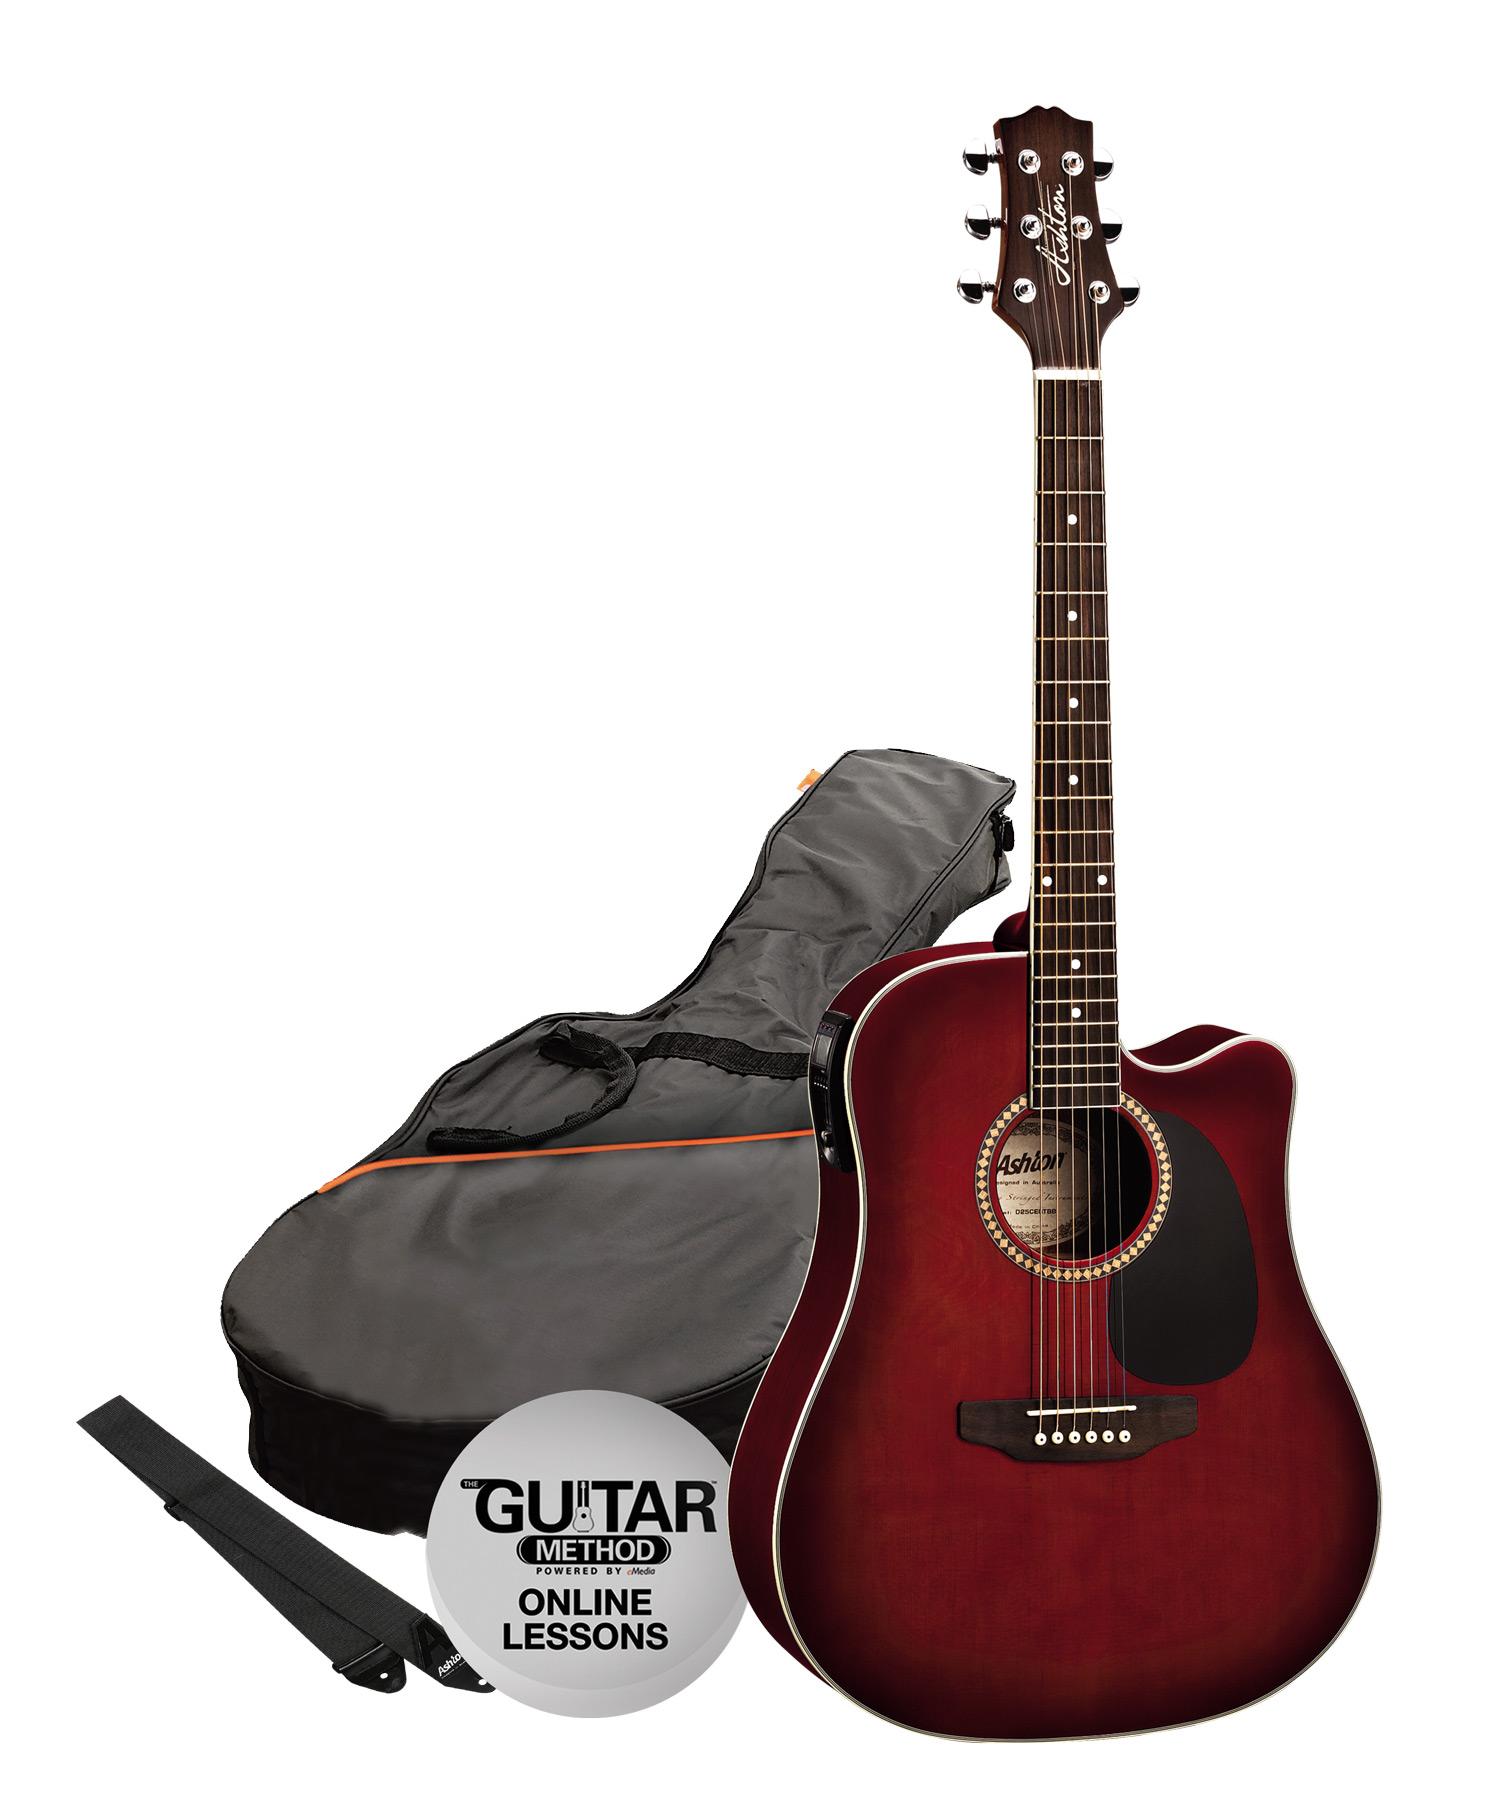 SPD25CEQWRS - Pack Guitarra Electroacustica Dreadnought Vino - Ashton